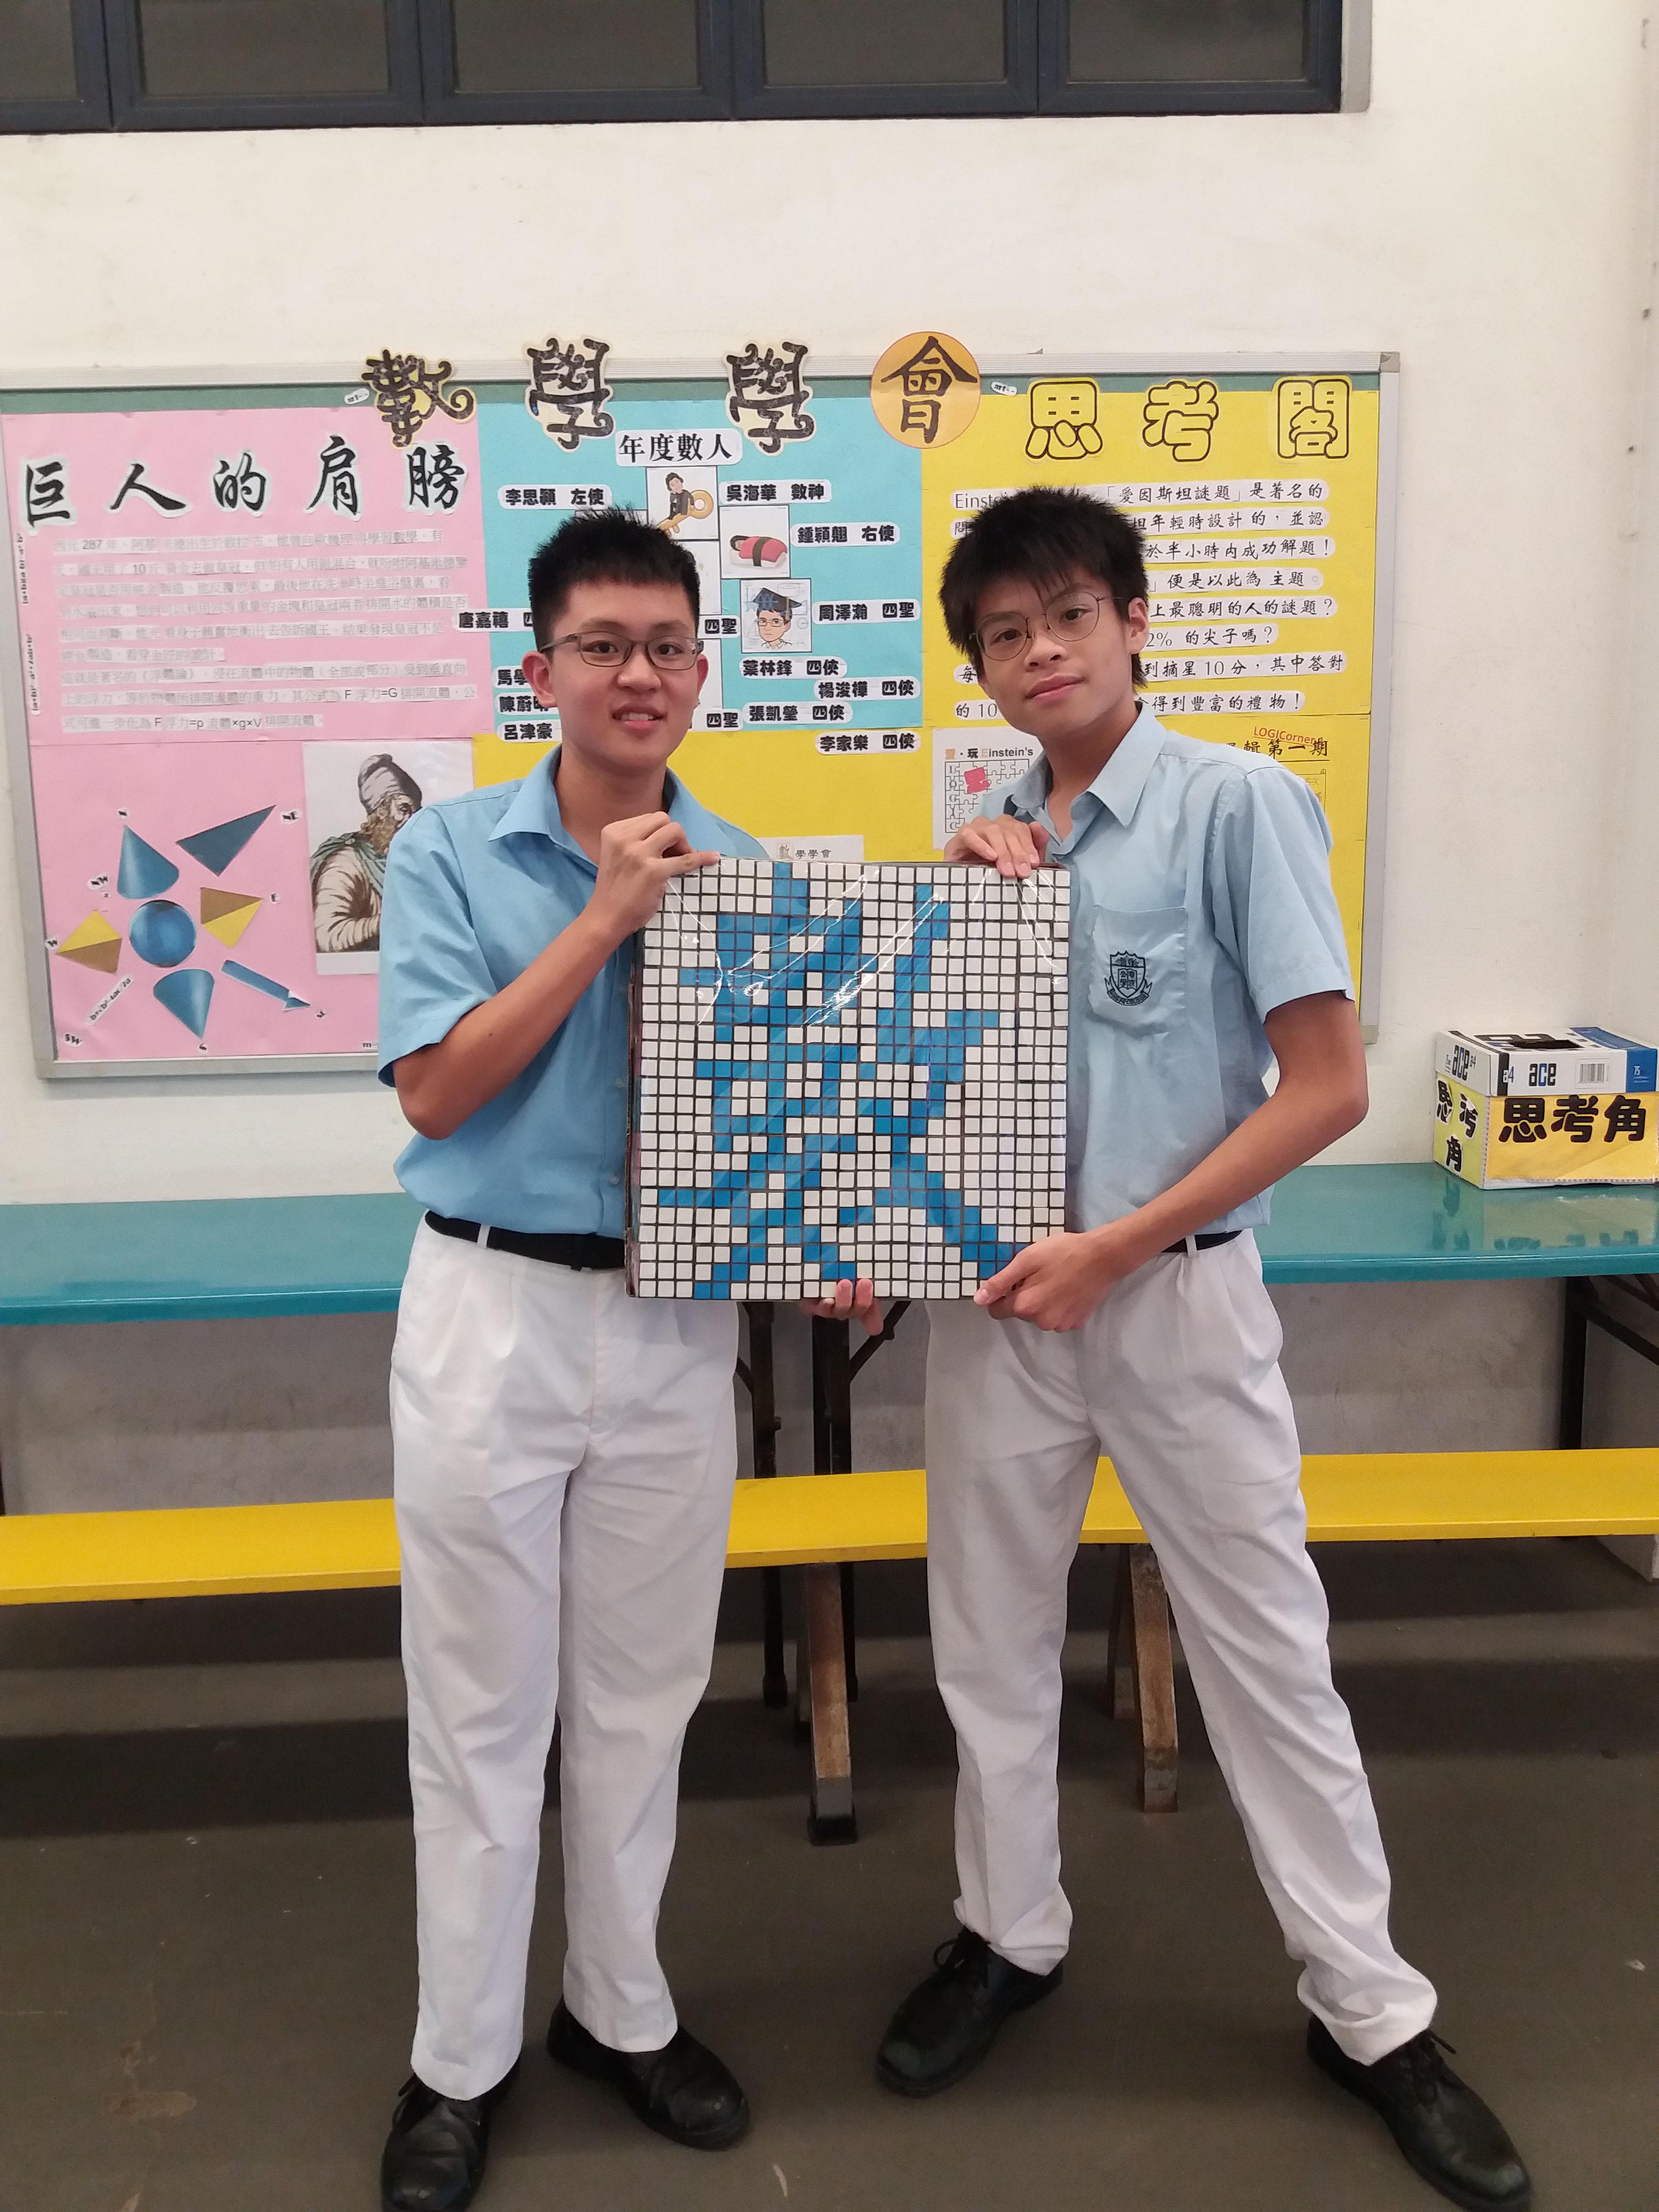 https://www.npc.edu.hk/sites/default/files/20191015_165901.jpg